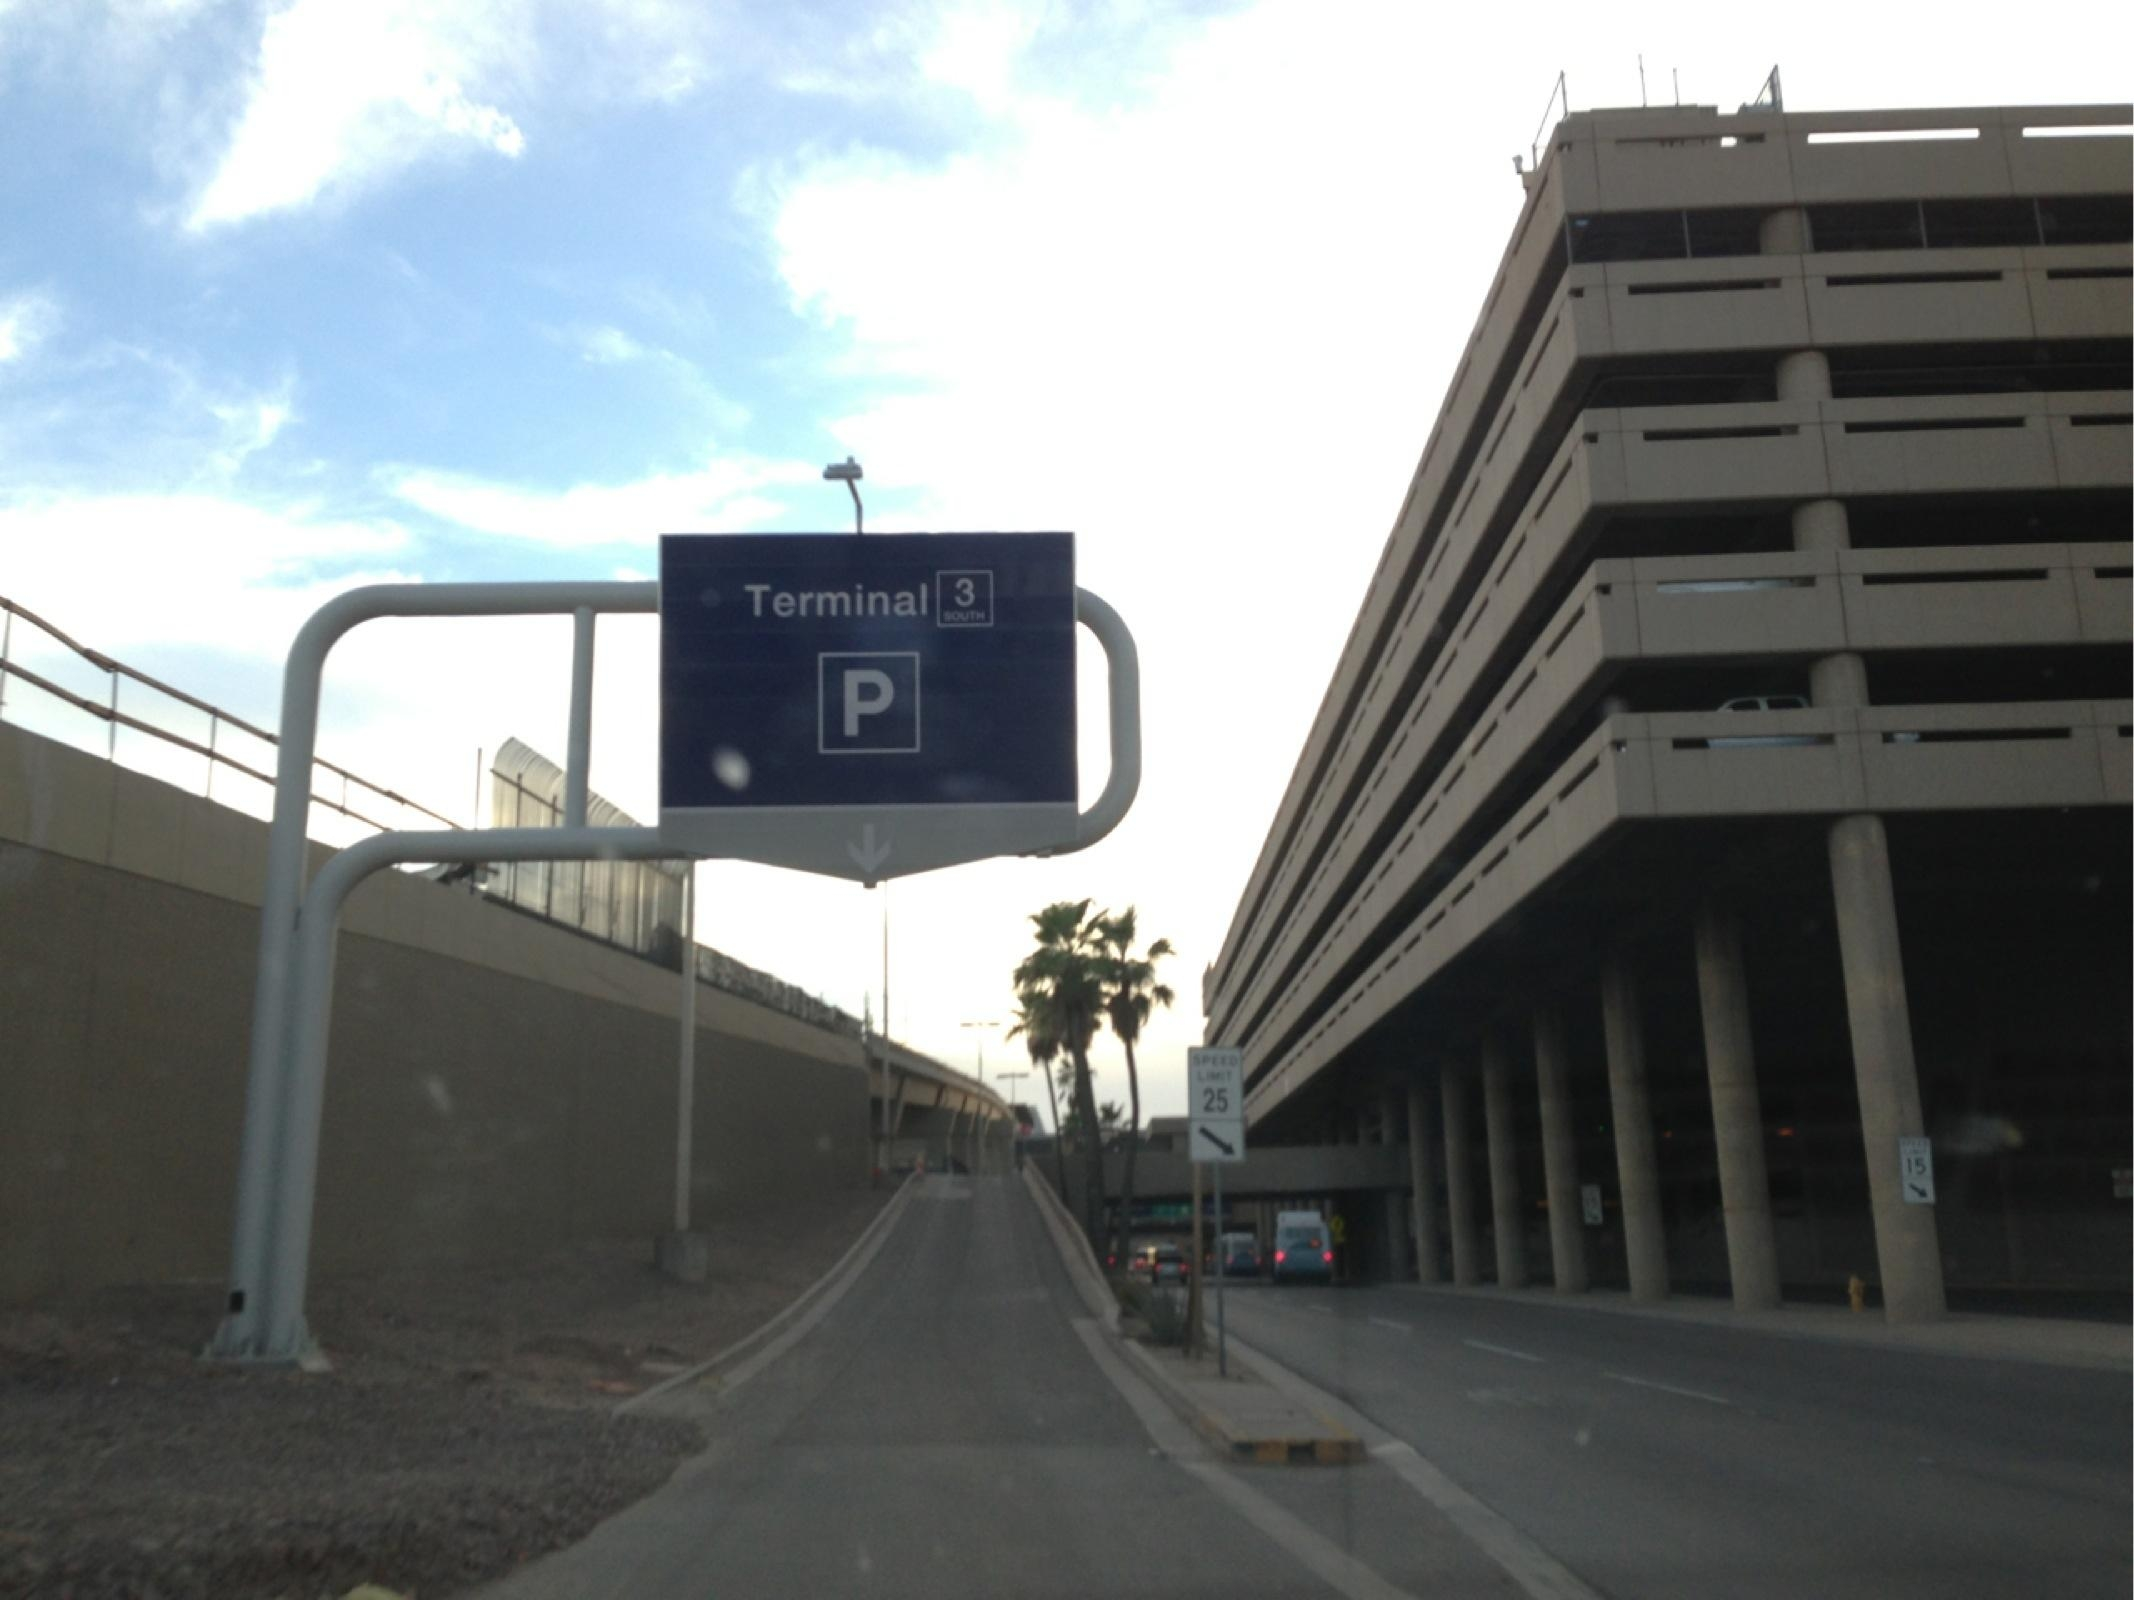 PHX - Terminal 3 Garage - Parking in Phoenix  ParkMe